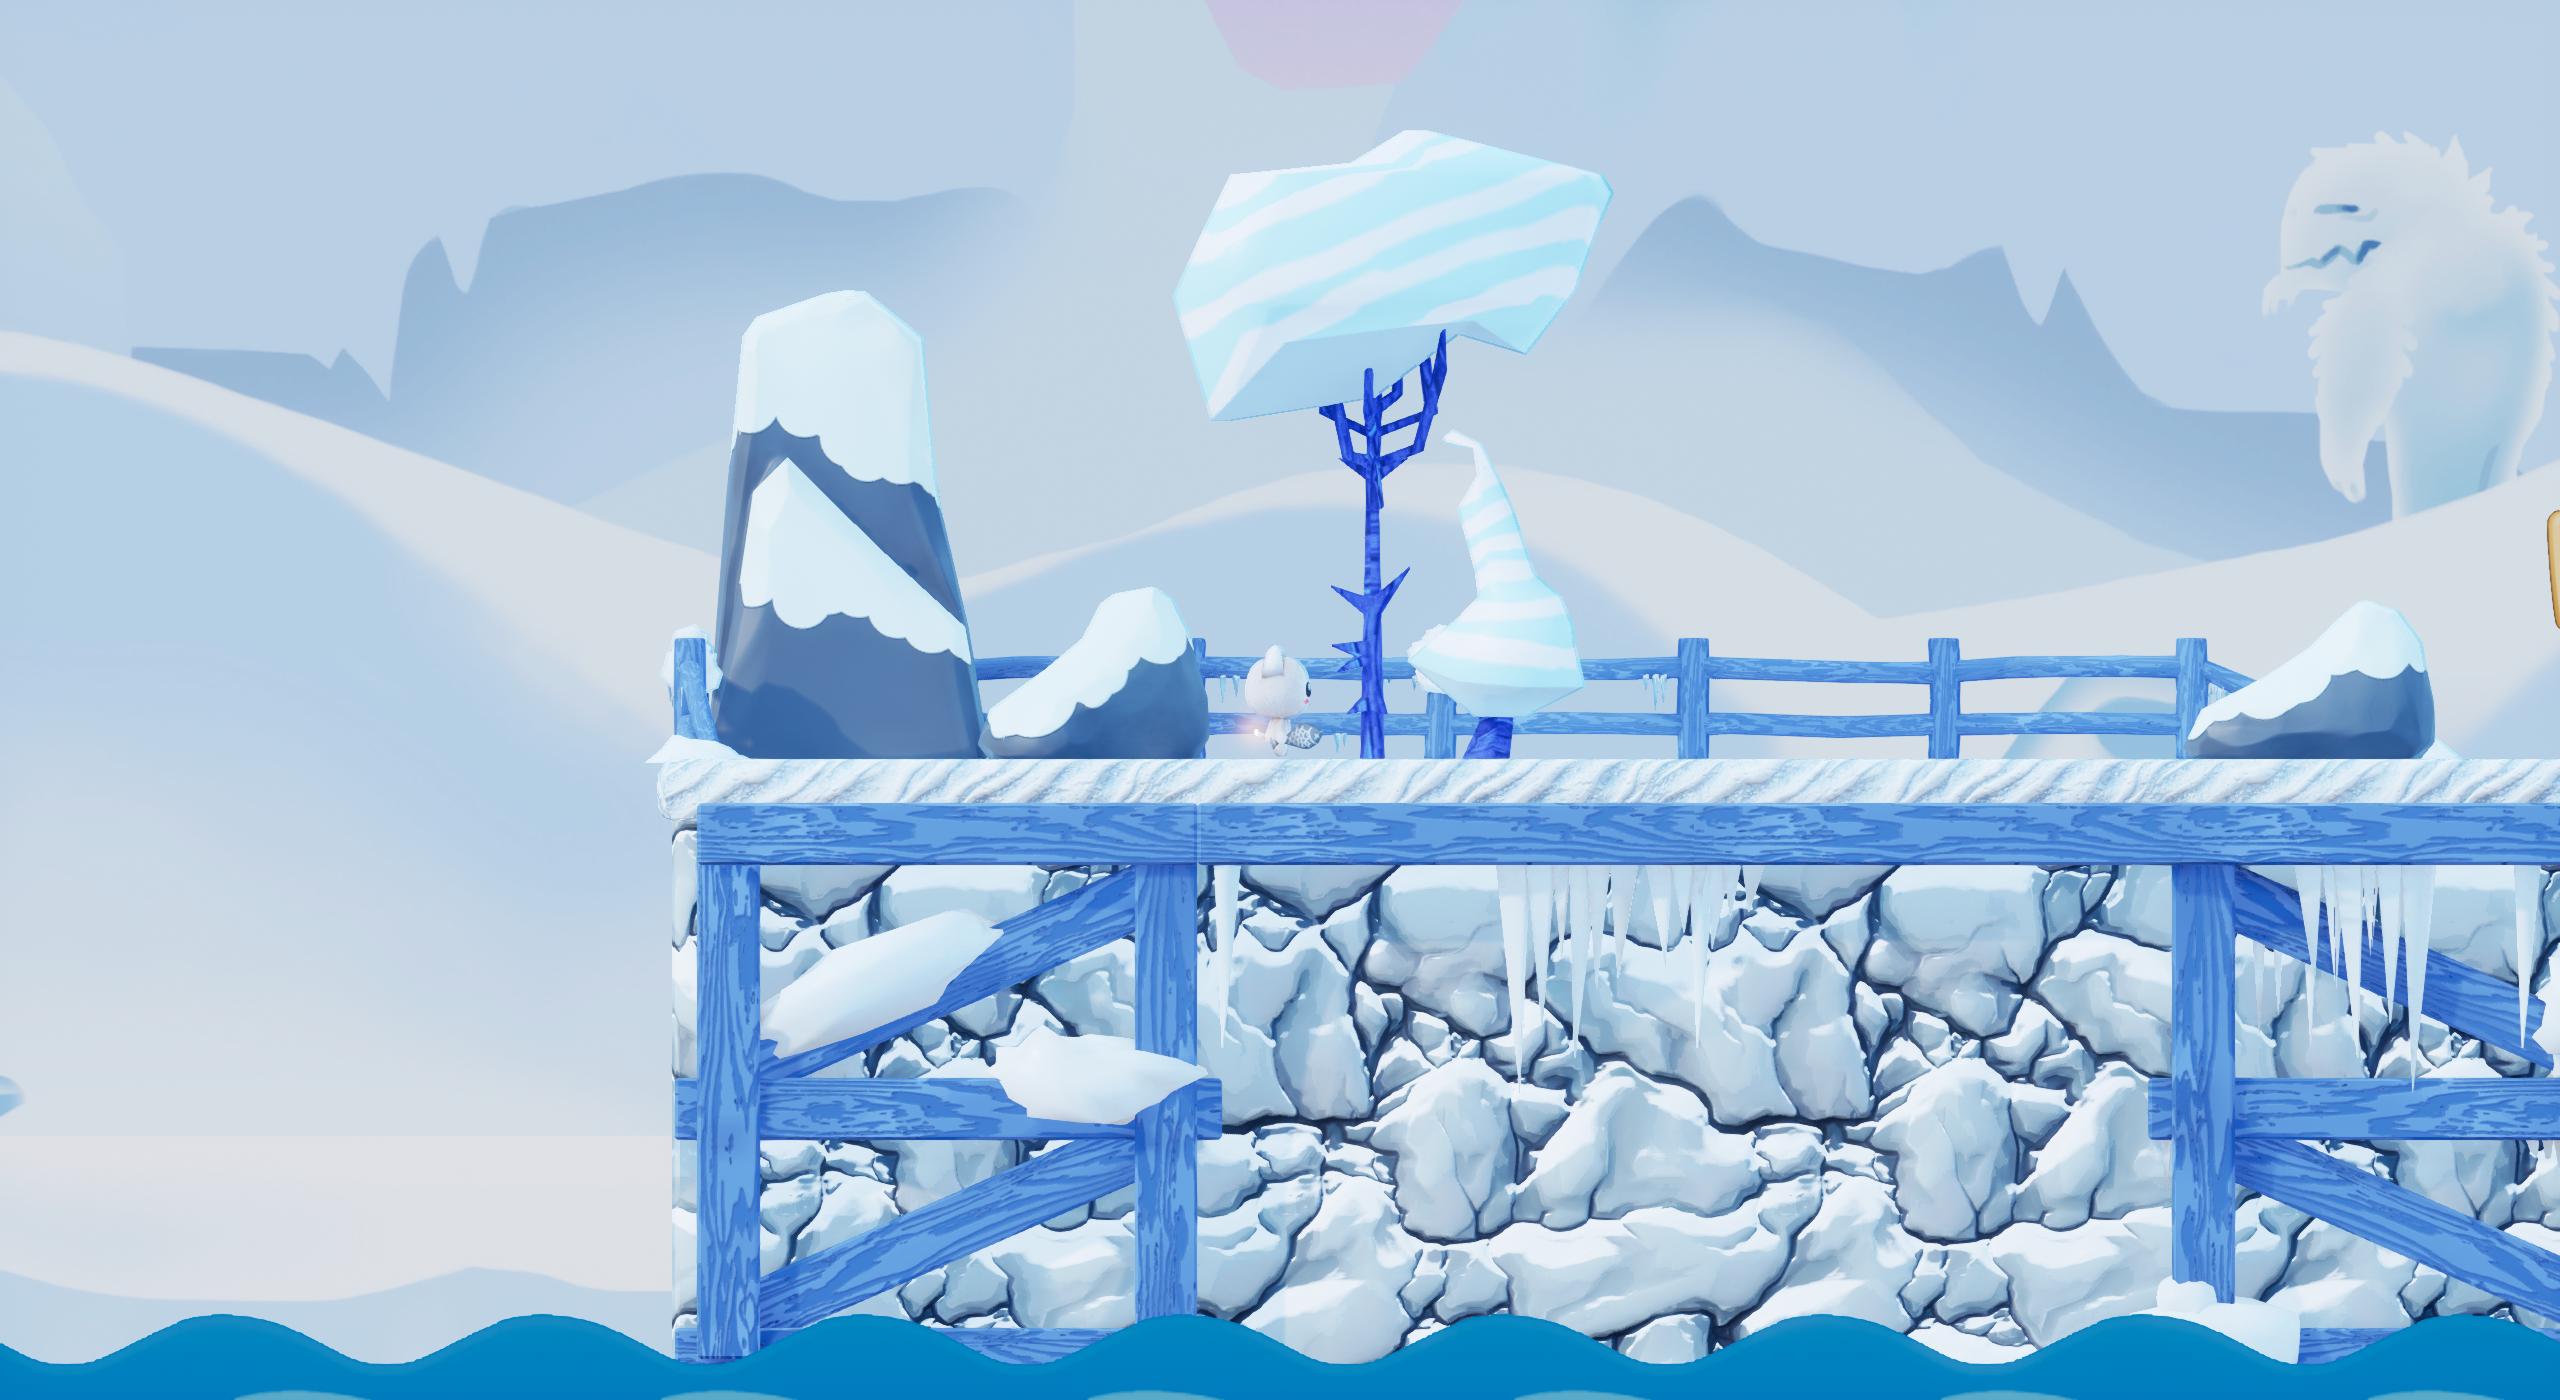 IceLevel03